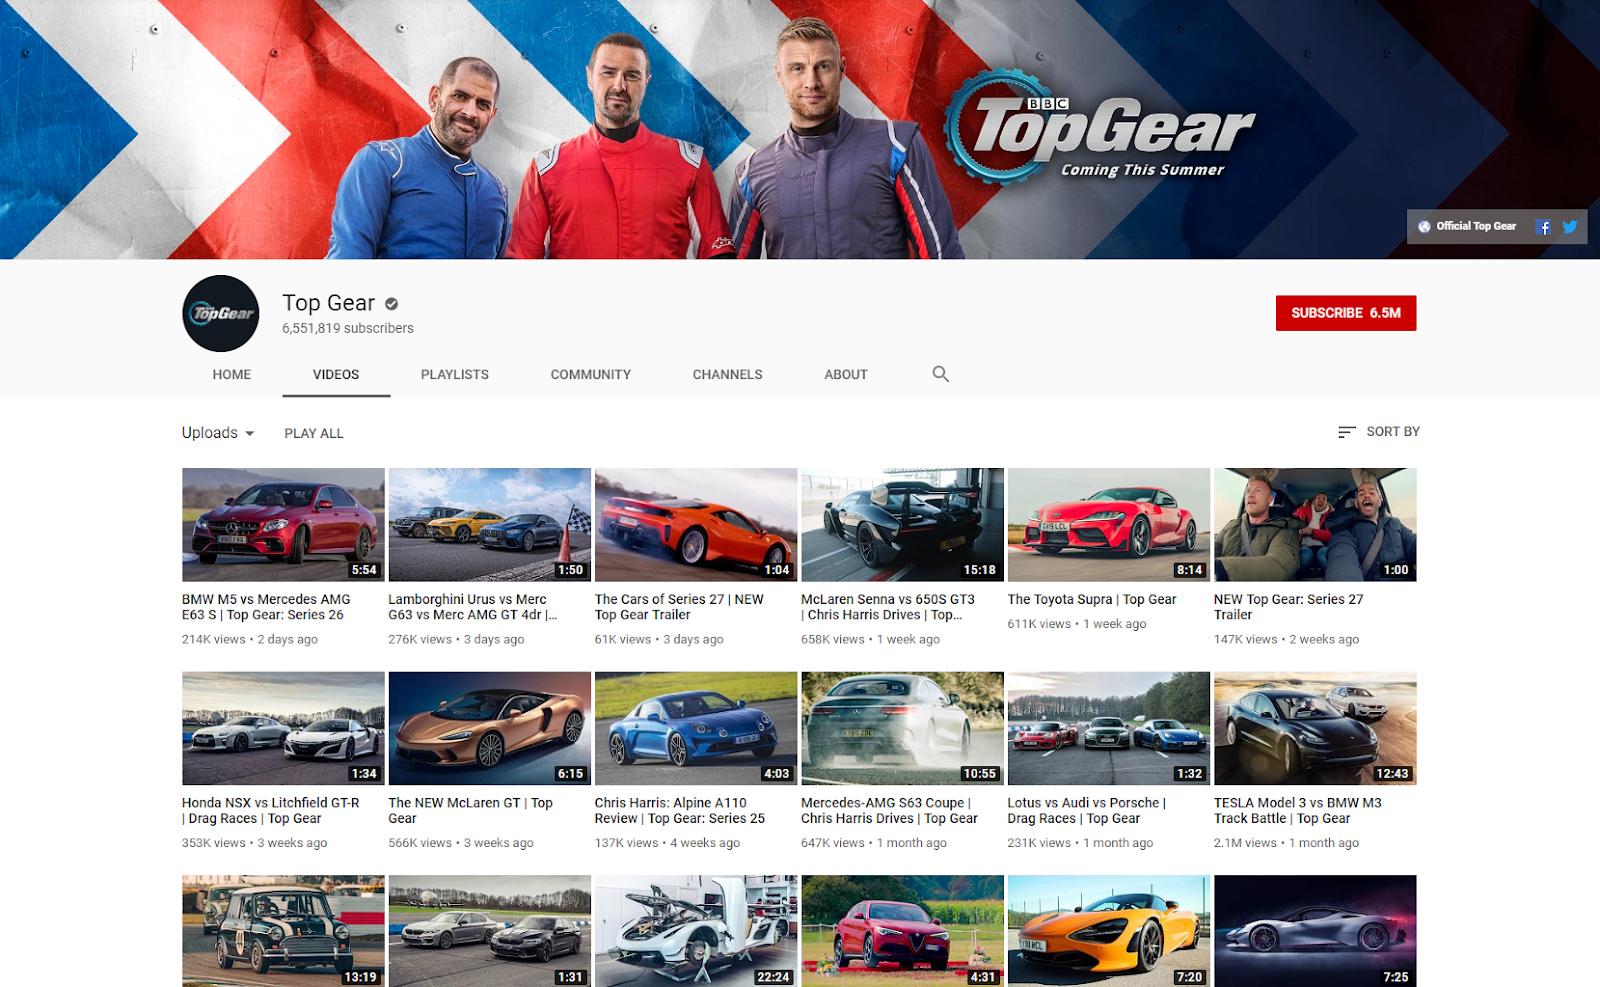 Top Gear YouTube topgear .com